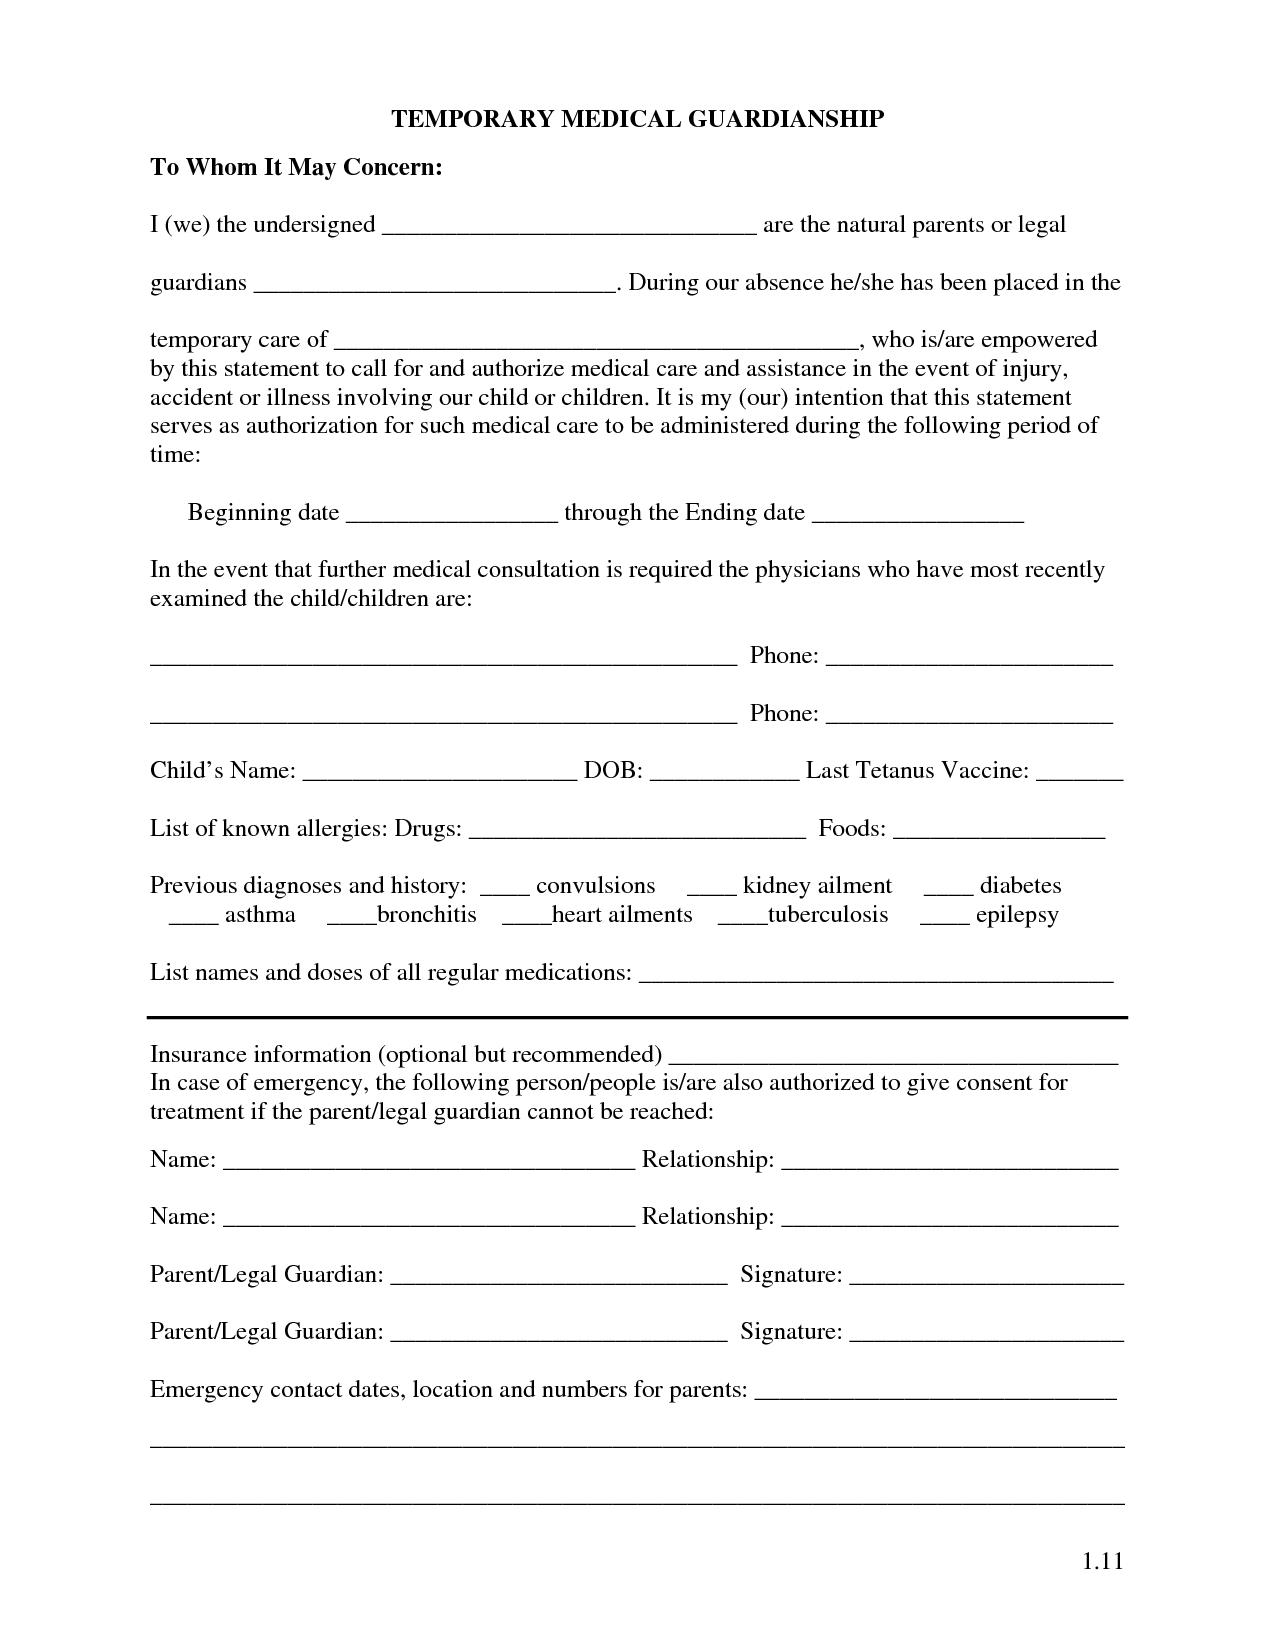 Free Printable Temporary Guardianship Forms | Forms | Child Custody - Free Printable Child Custody Papers